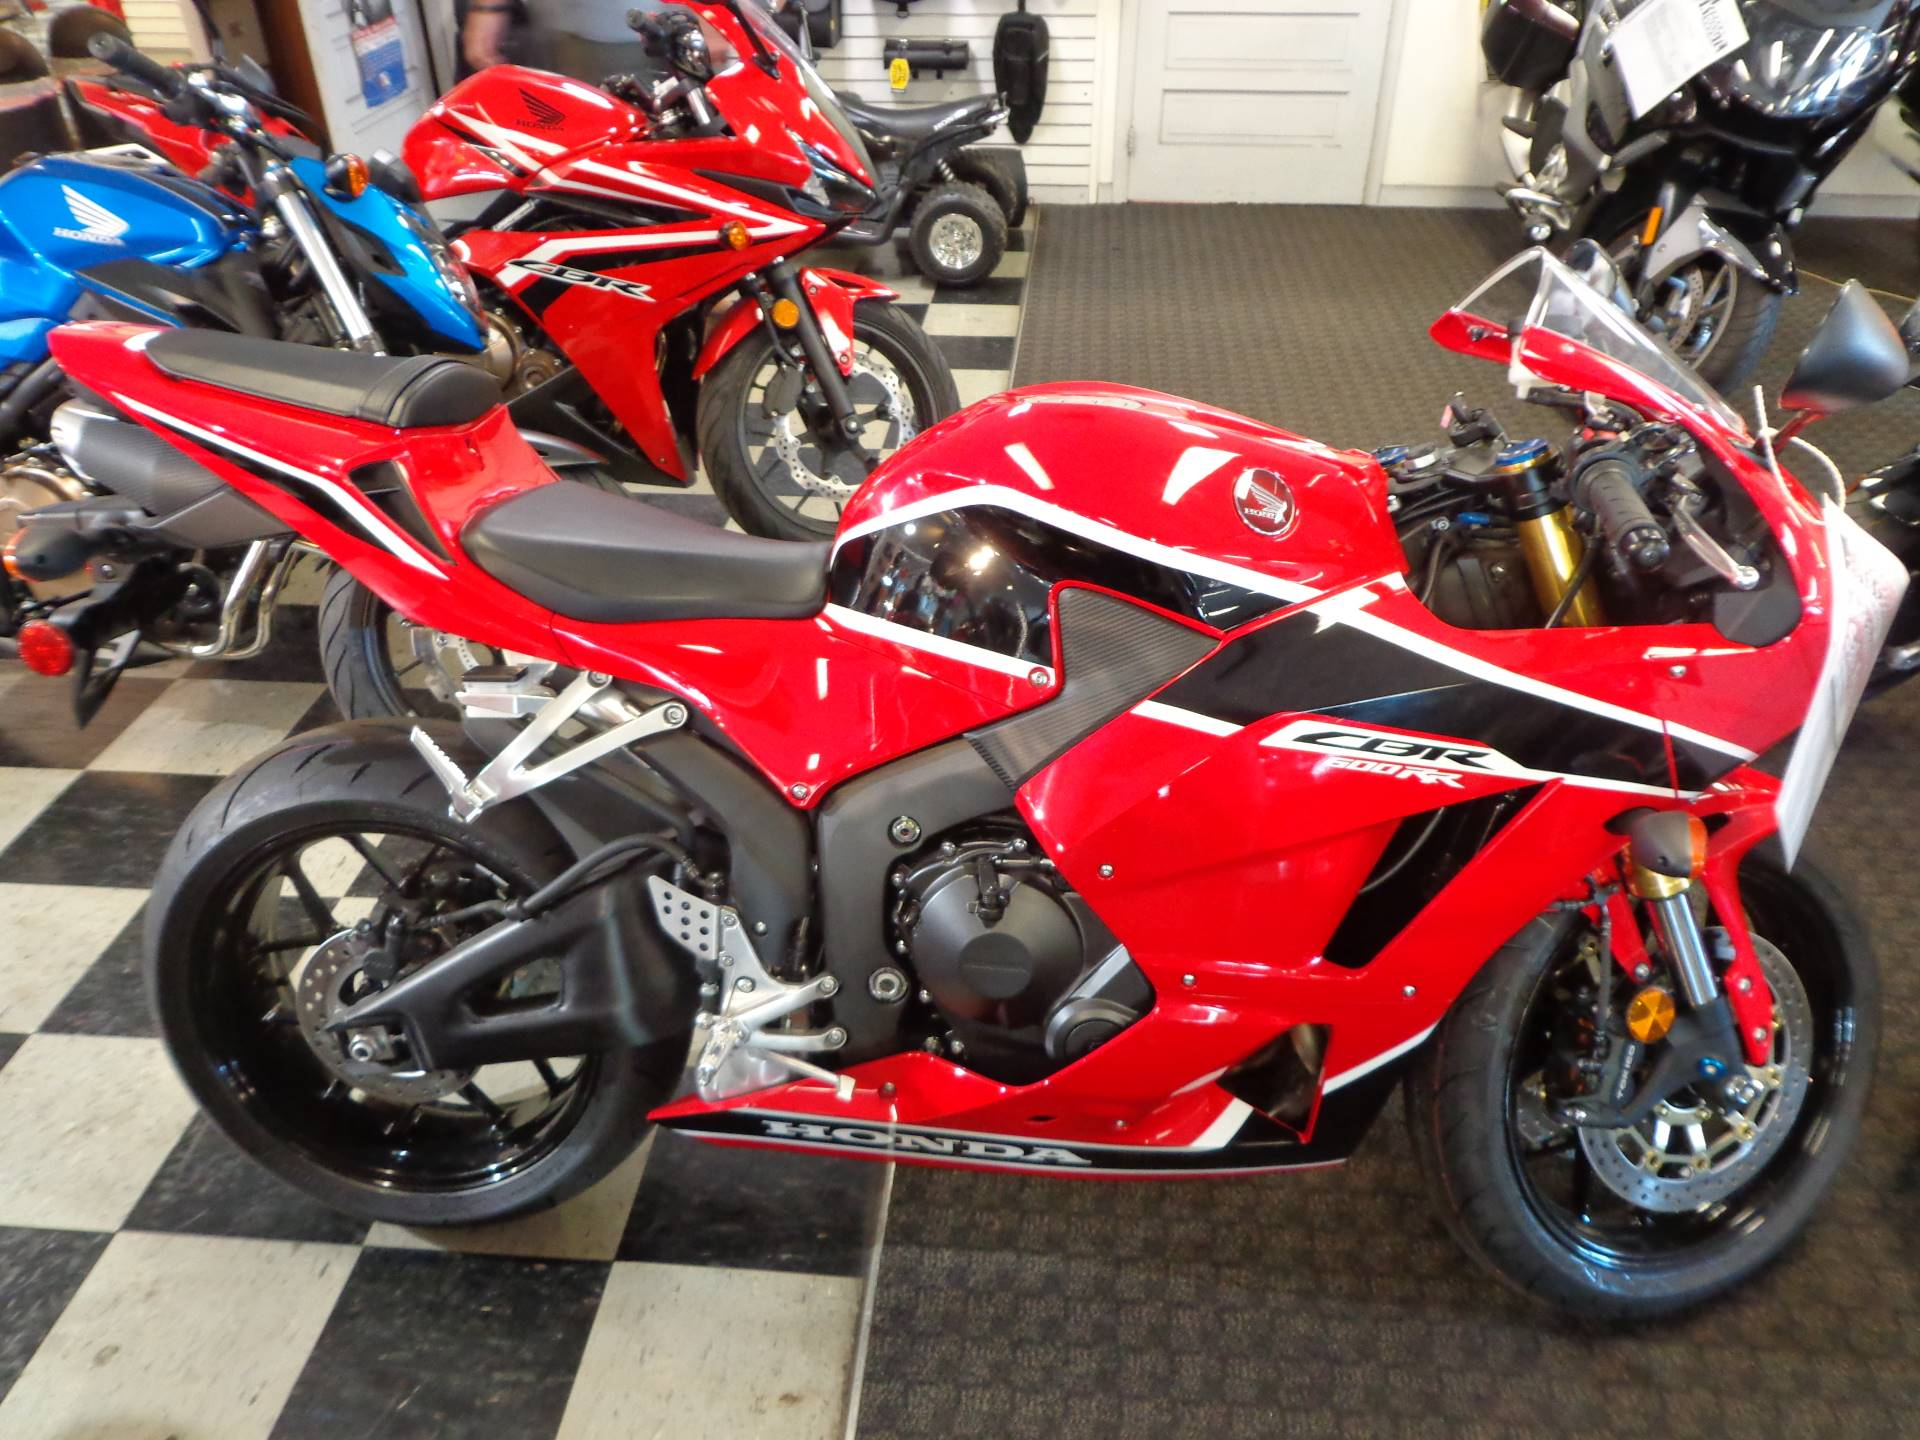 New 2018 Honda Cbr600rr Motorcycles In Sarasota Fl Nhm1423 Grand